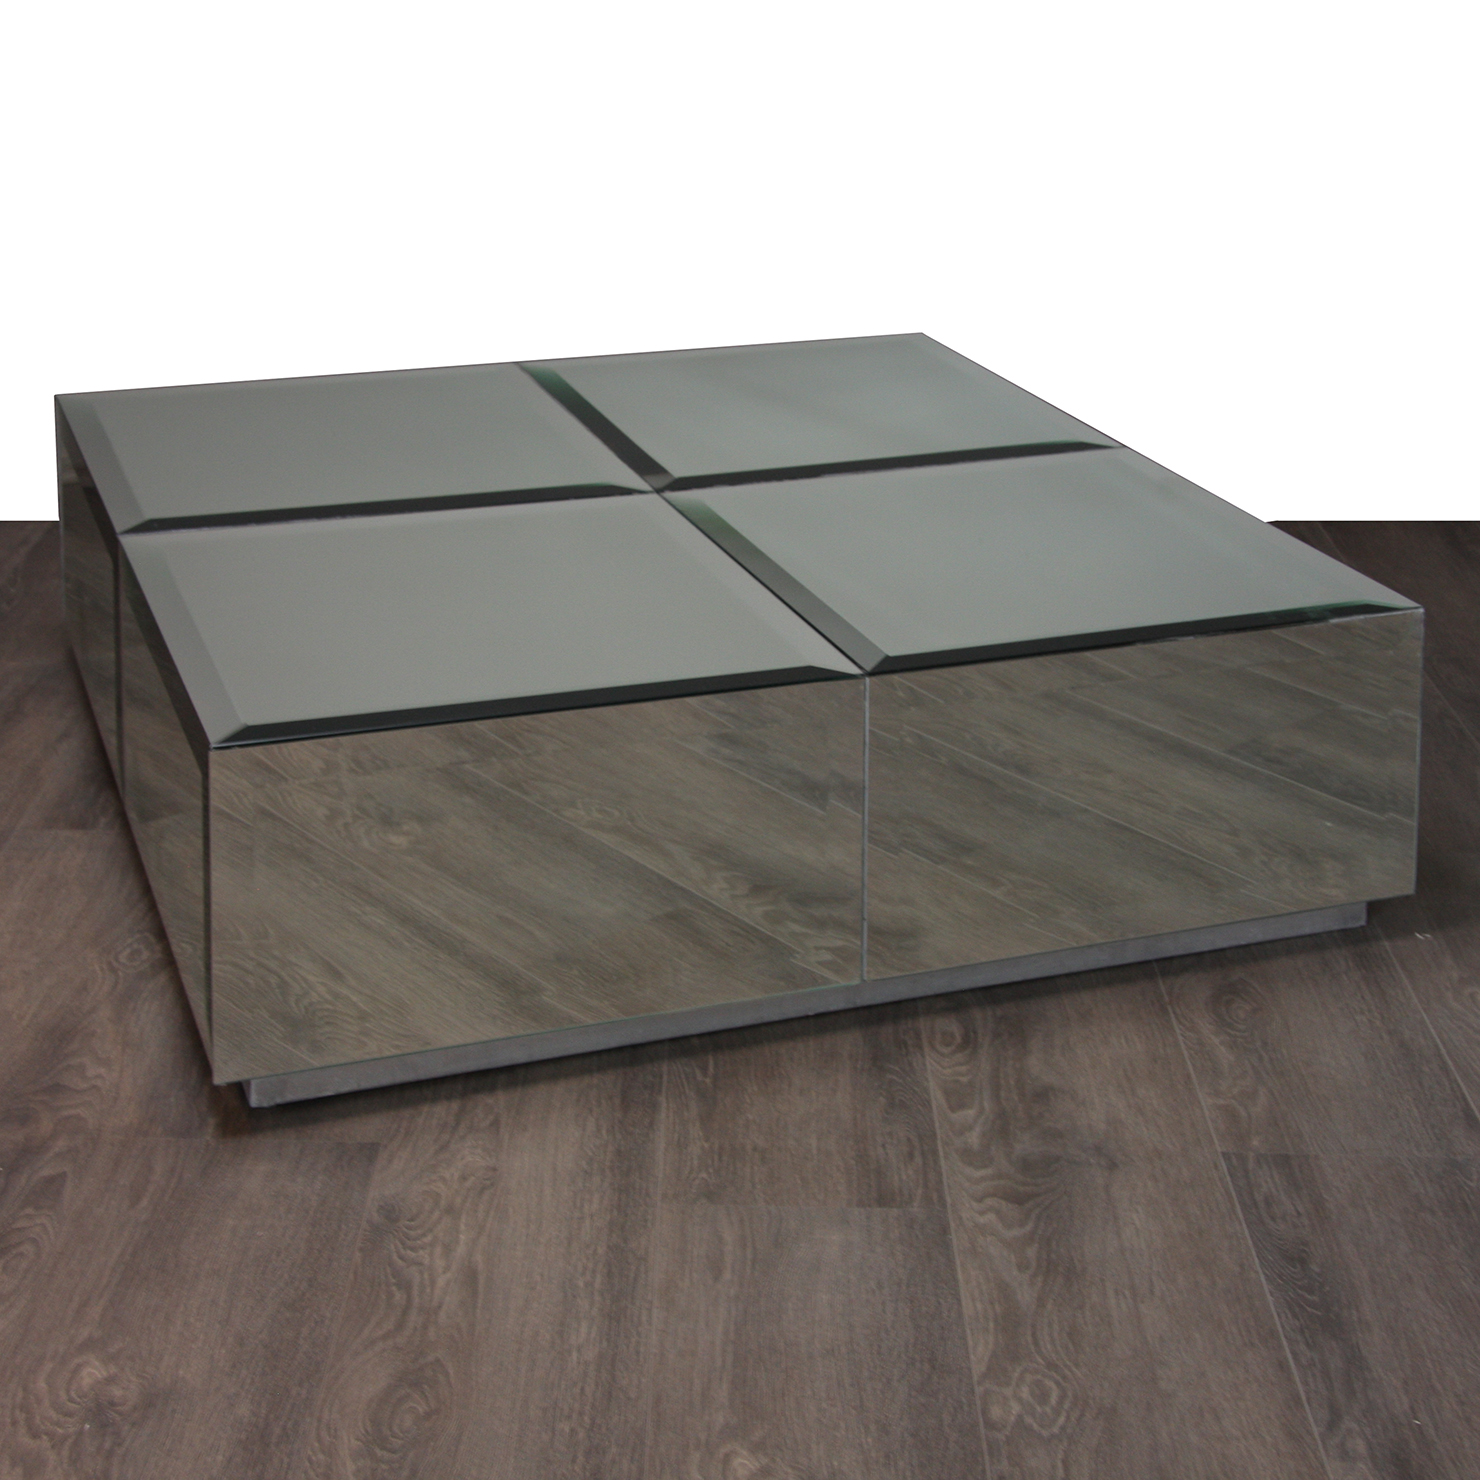 Fabricarte categor as mesas de centro y de acento - Espejos de mesa baratos ...